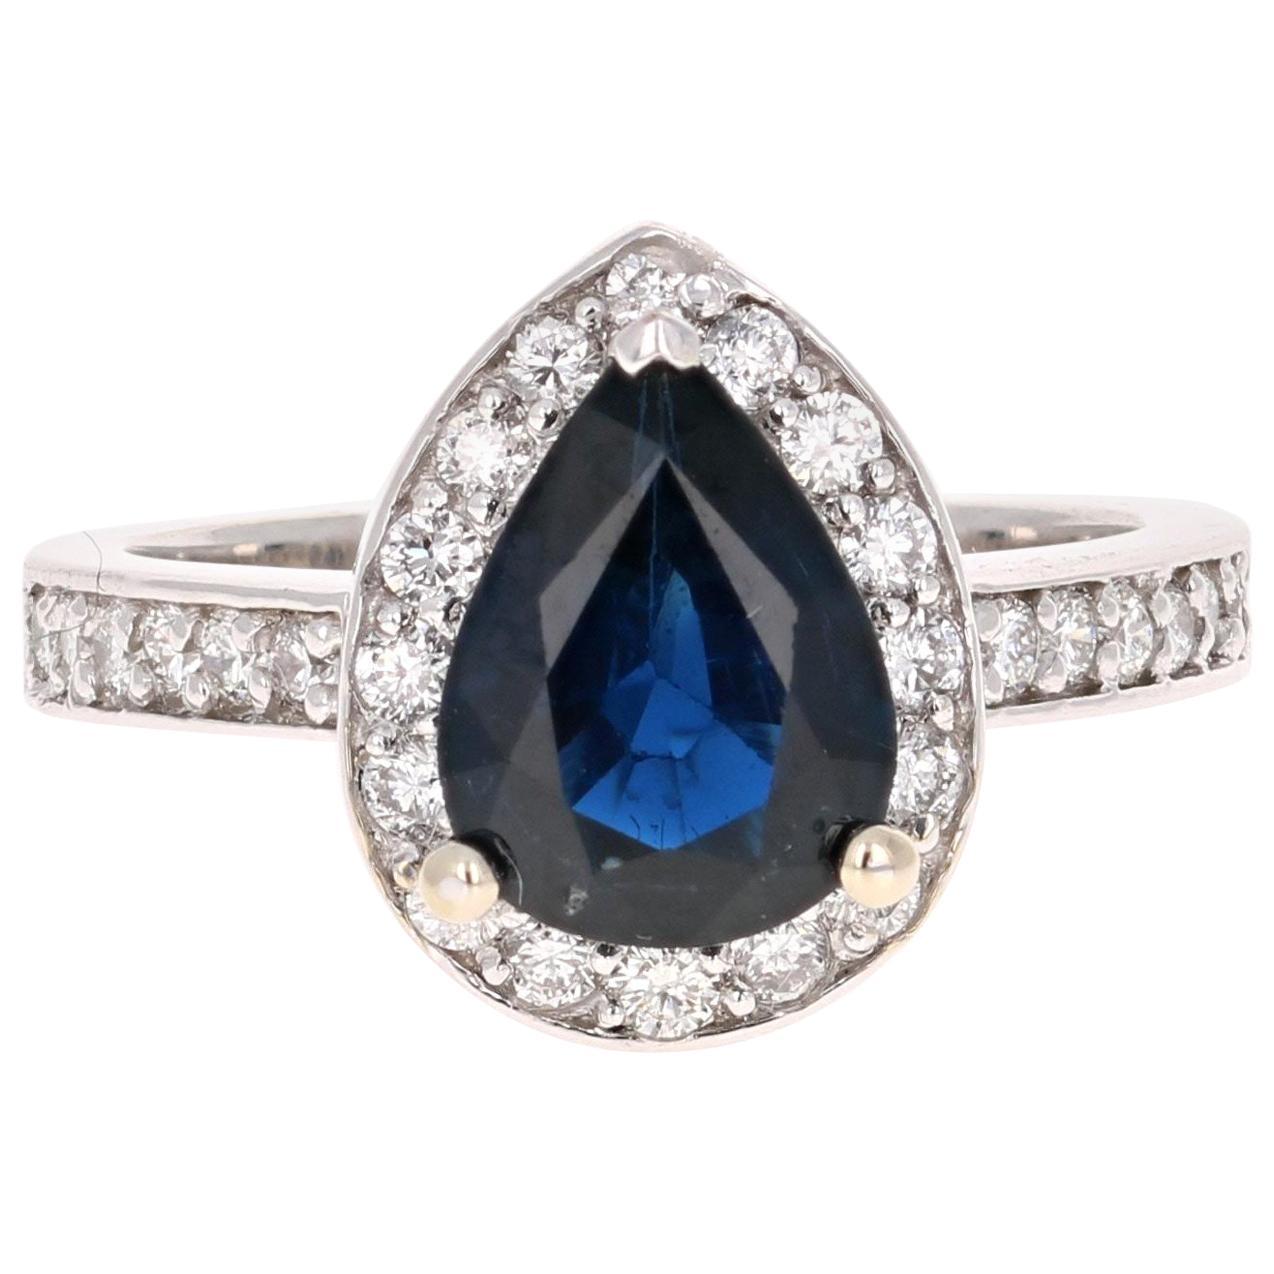 2.44 Carat Blue Sapphire Diamond White Gold Engagement Ring